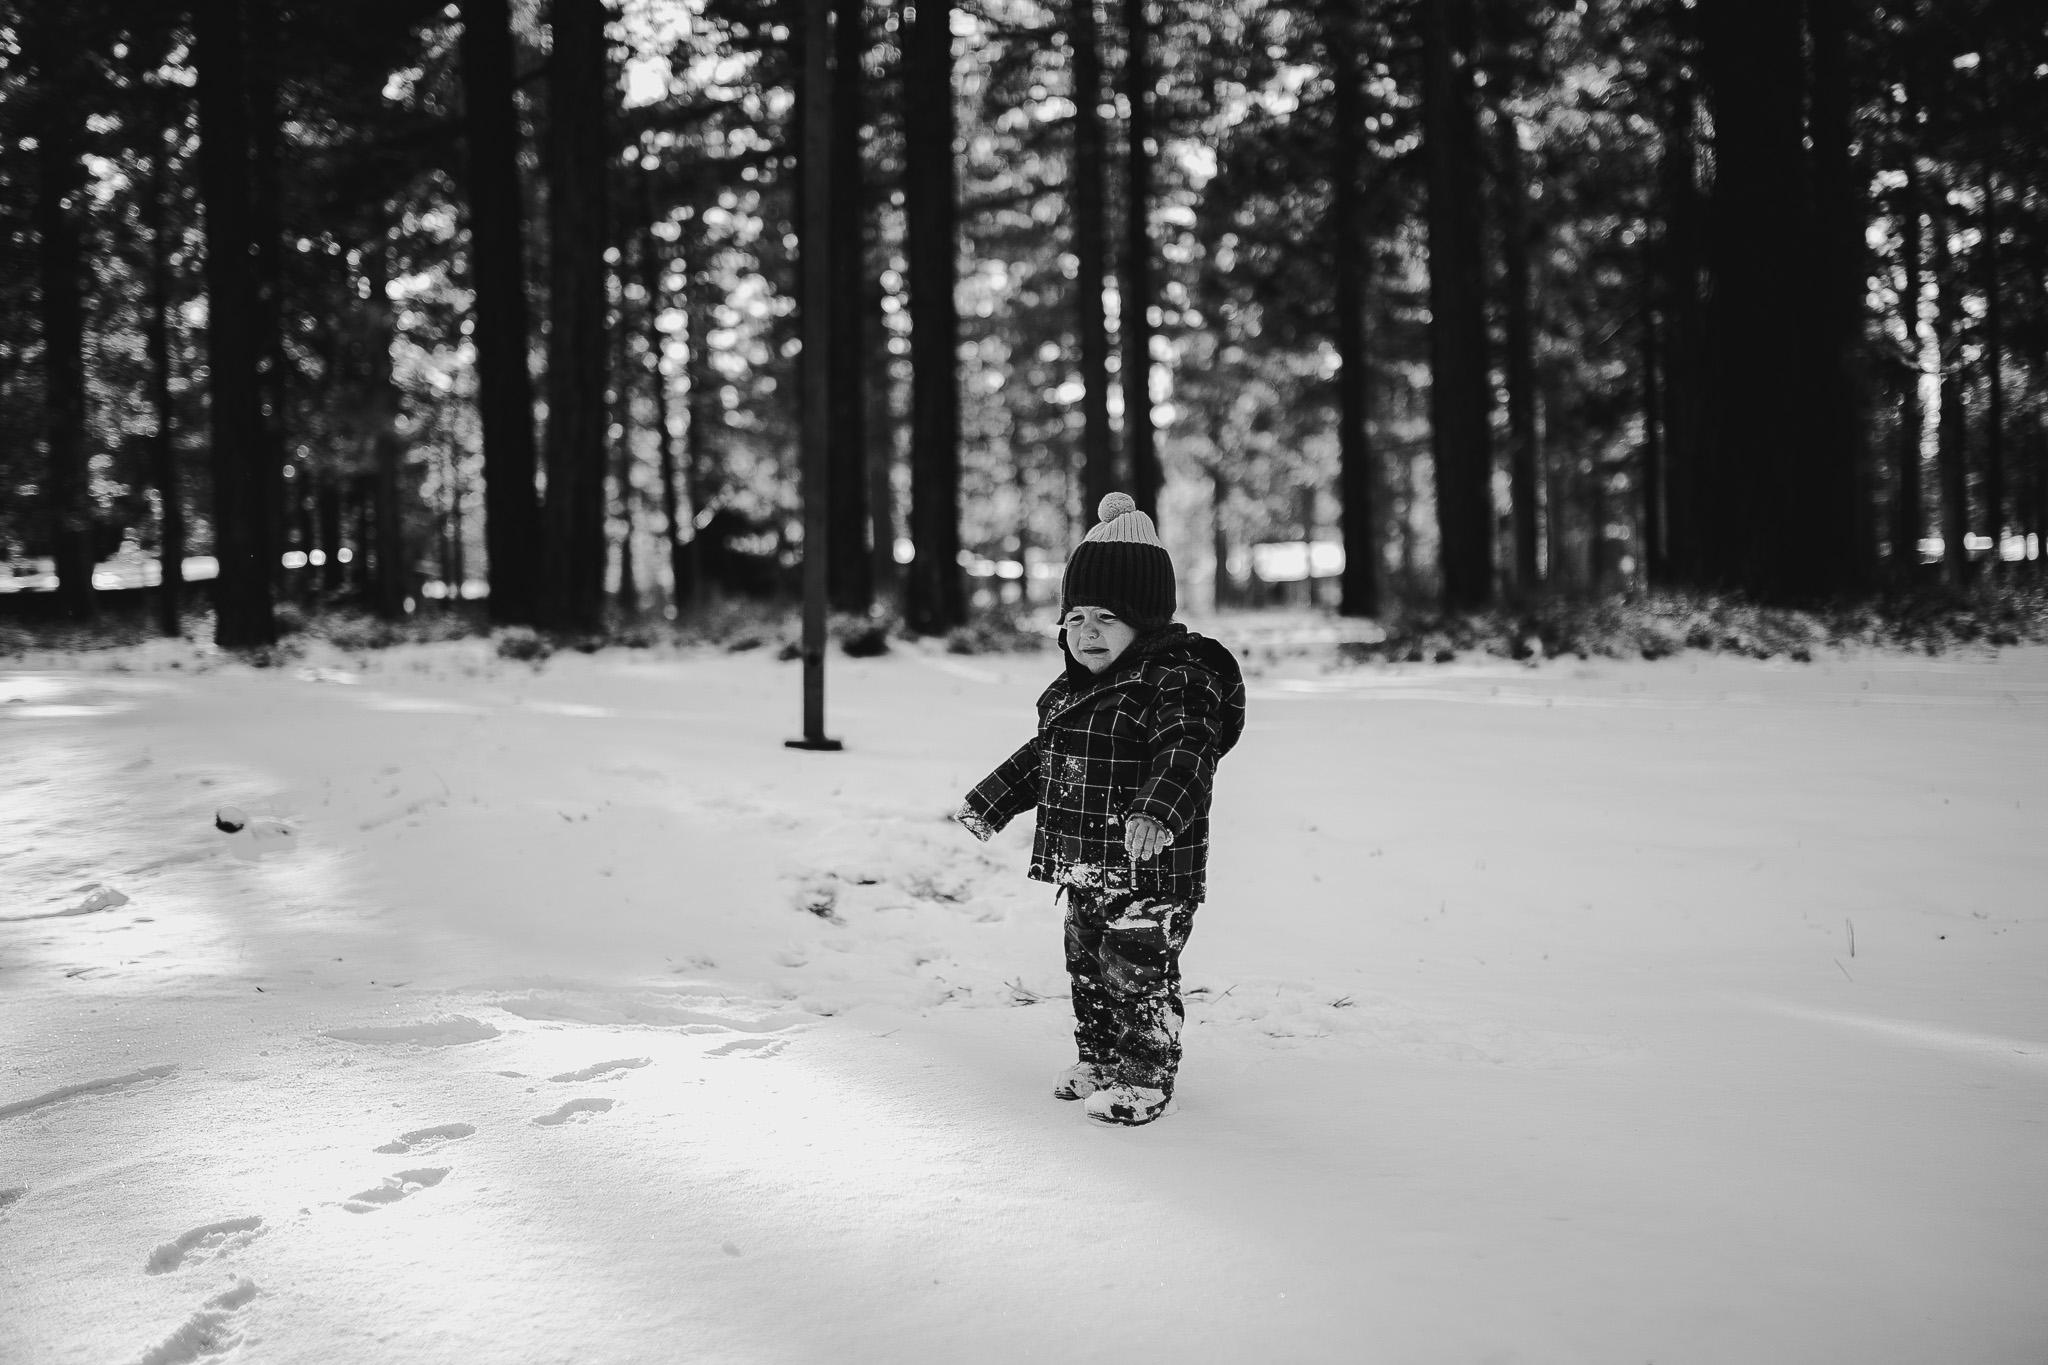 Archer Inspired Photography Family Road Trip Lifestyle Photos NorCal Sacramento South Lake Tahoe Reno Truckee Documentary Memories-82.jpg